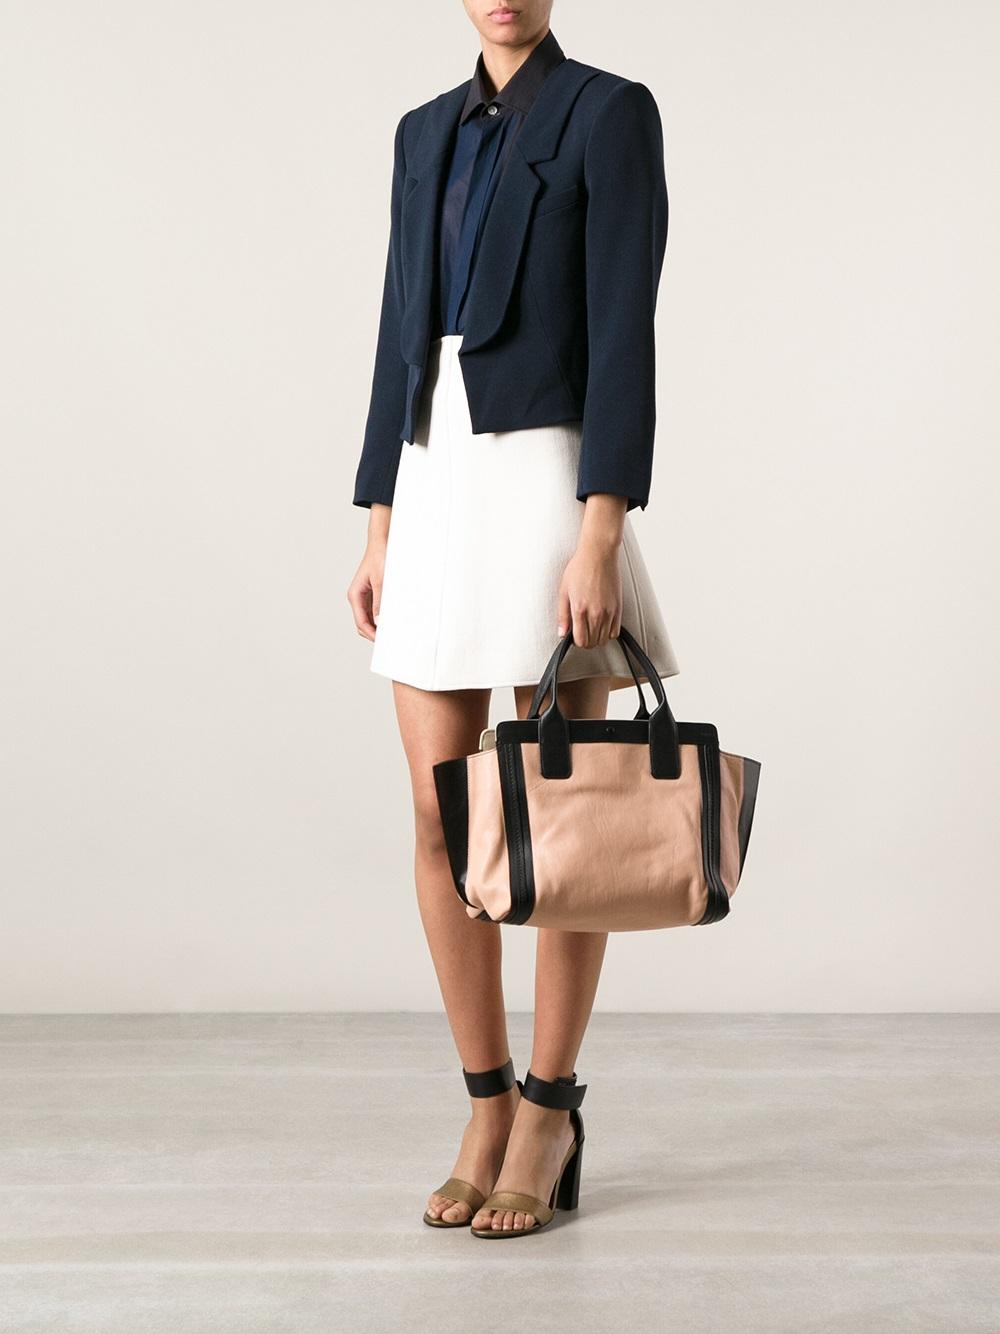 chloe handbags online - chloe leather alison tote, chloe purse